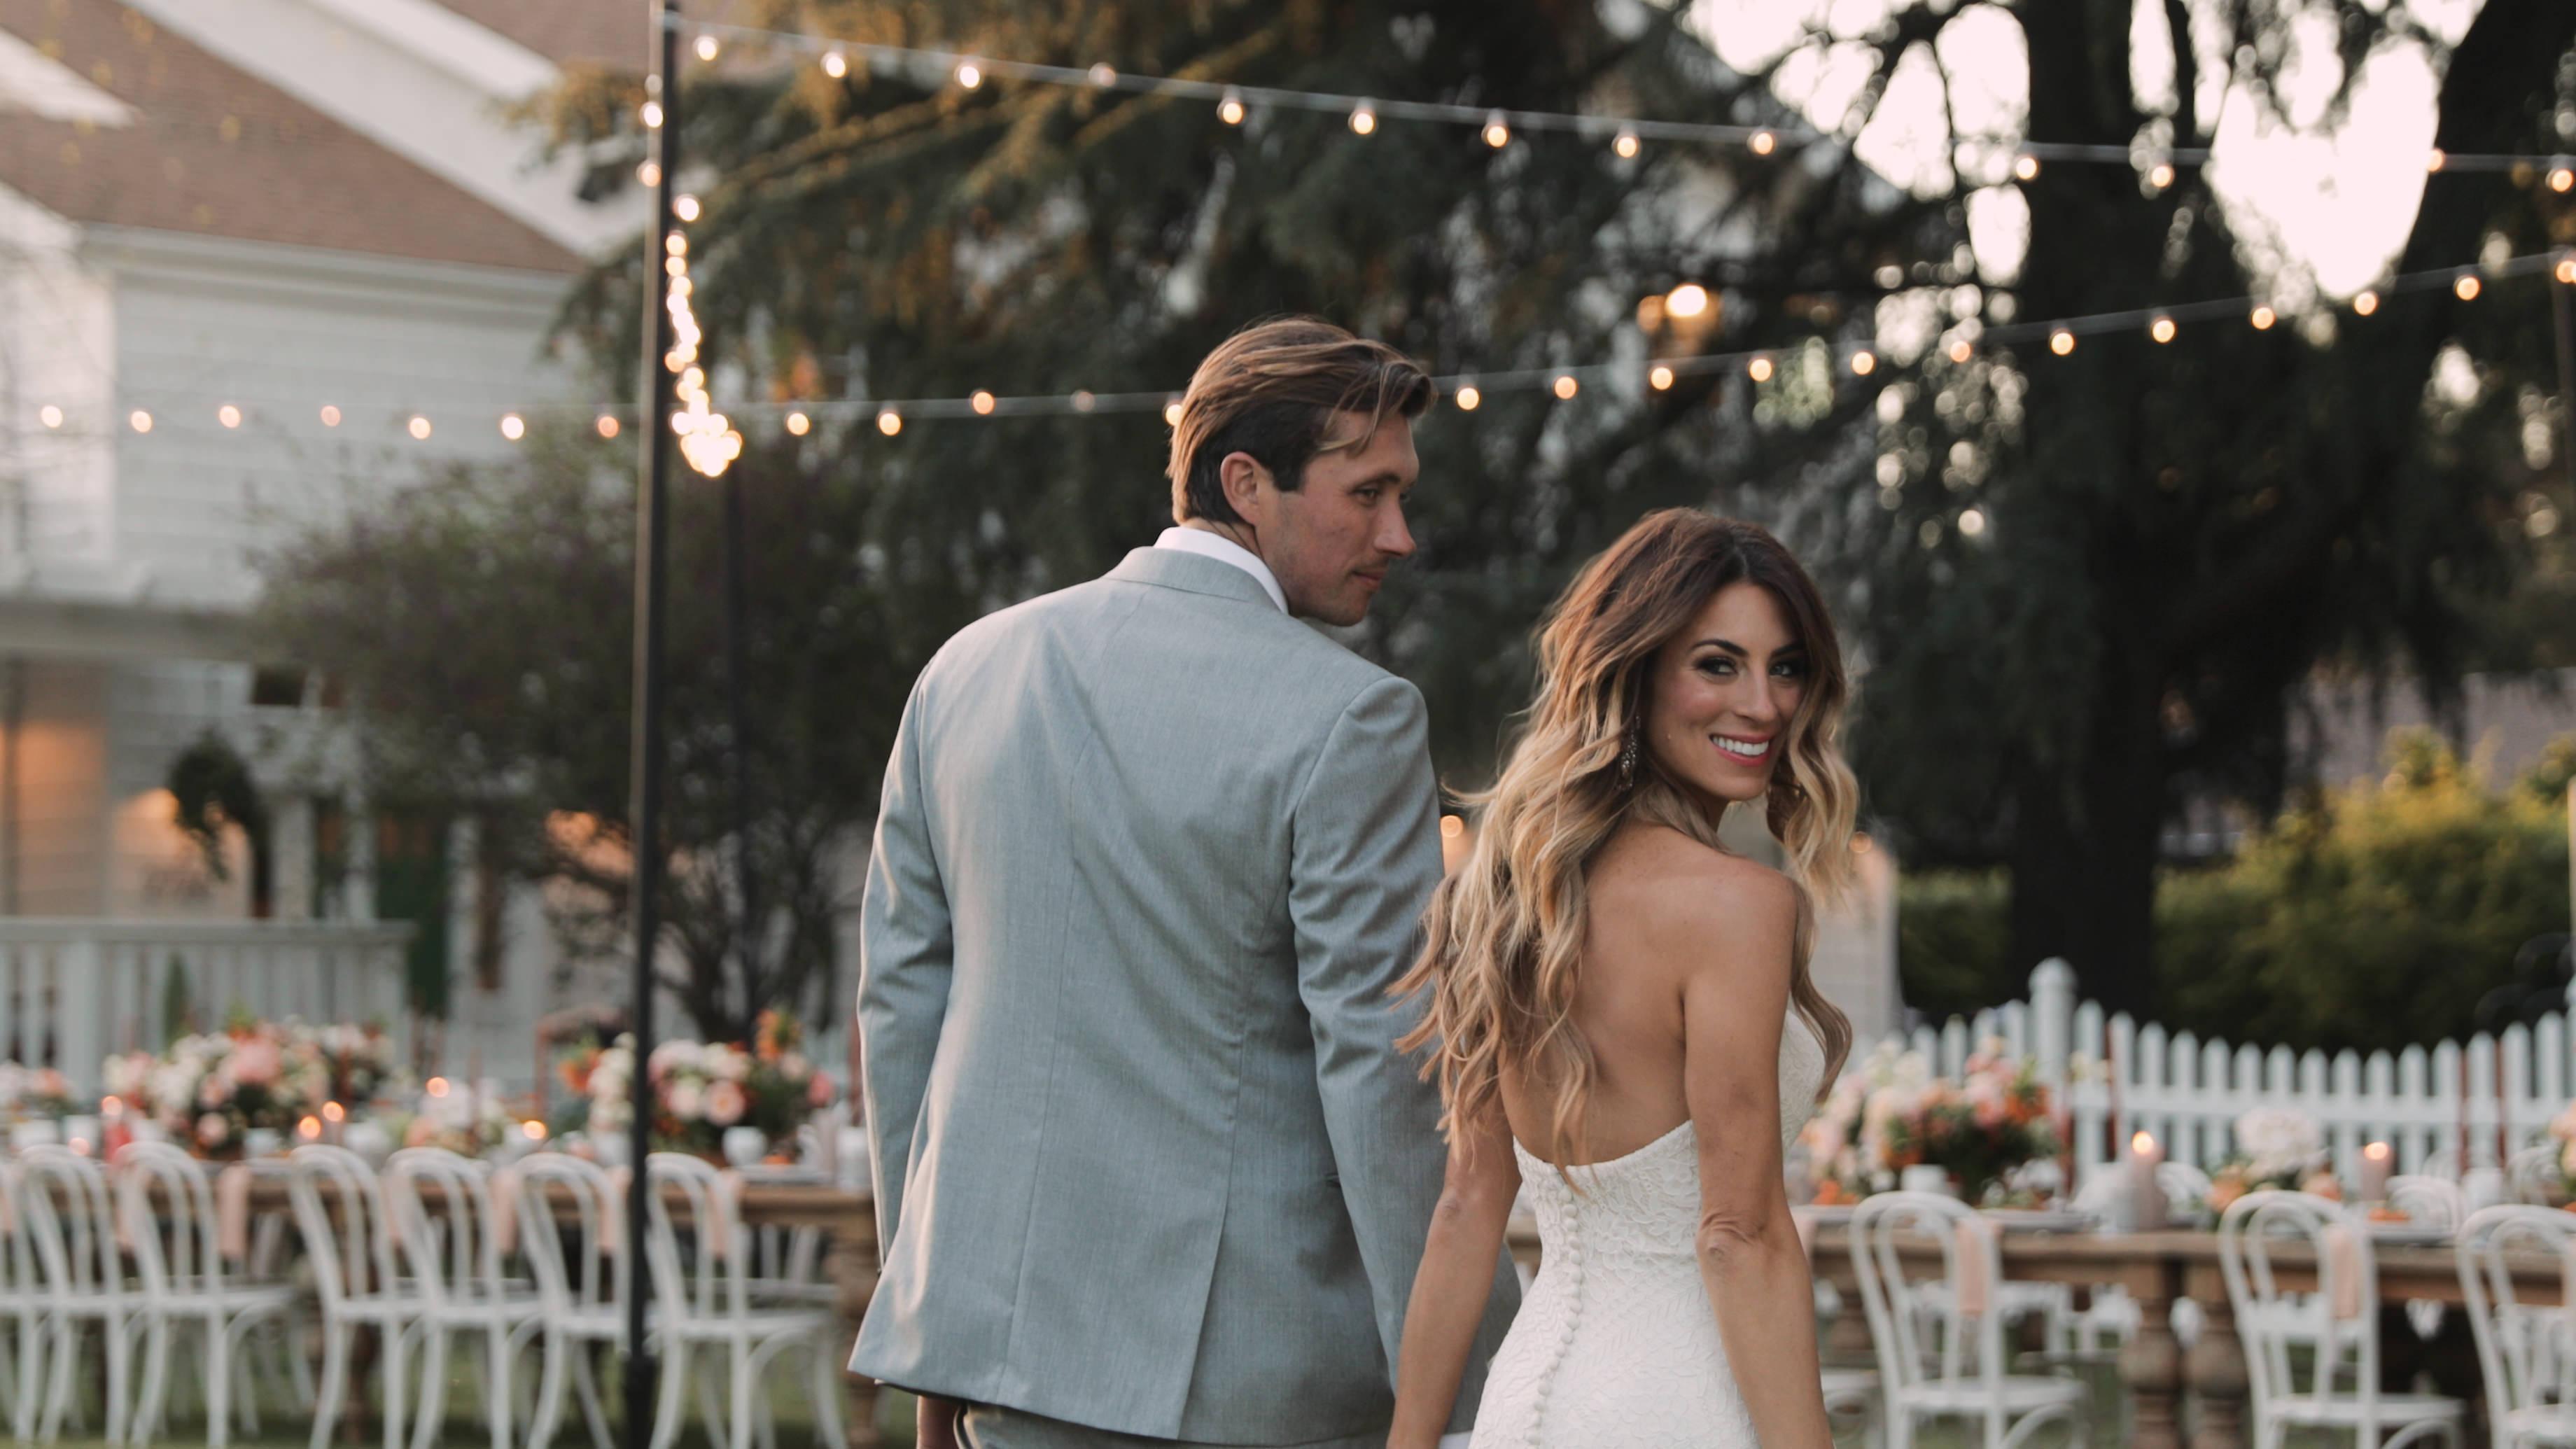 Tenley + Taylor | San Marcos, California | Chez Balliet